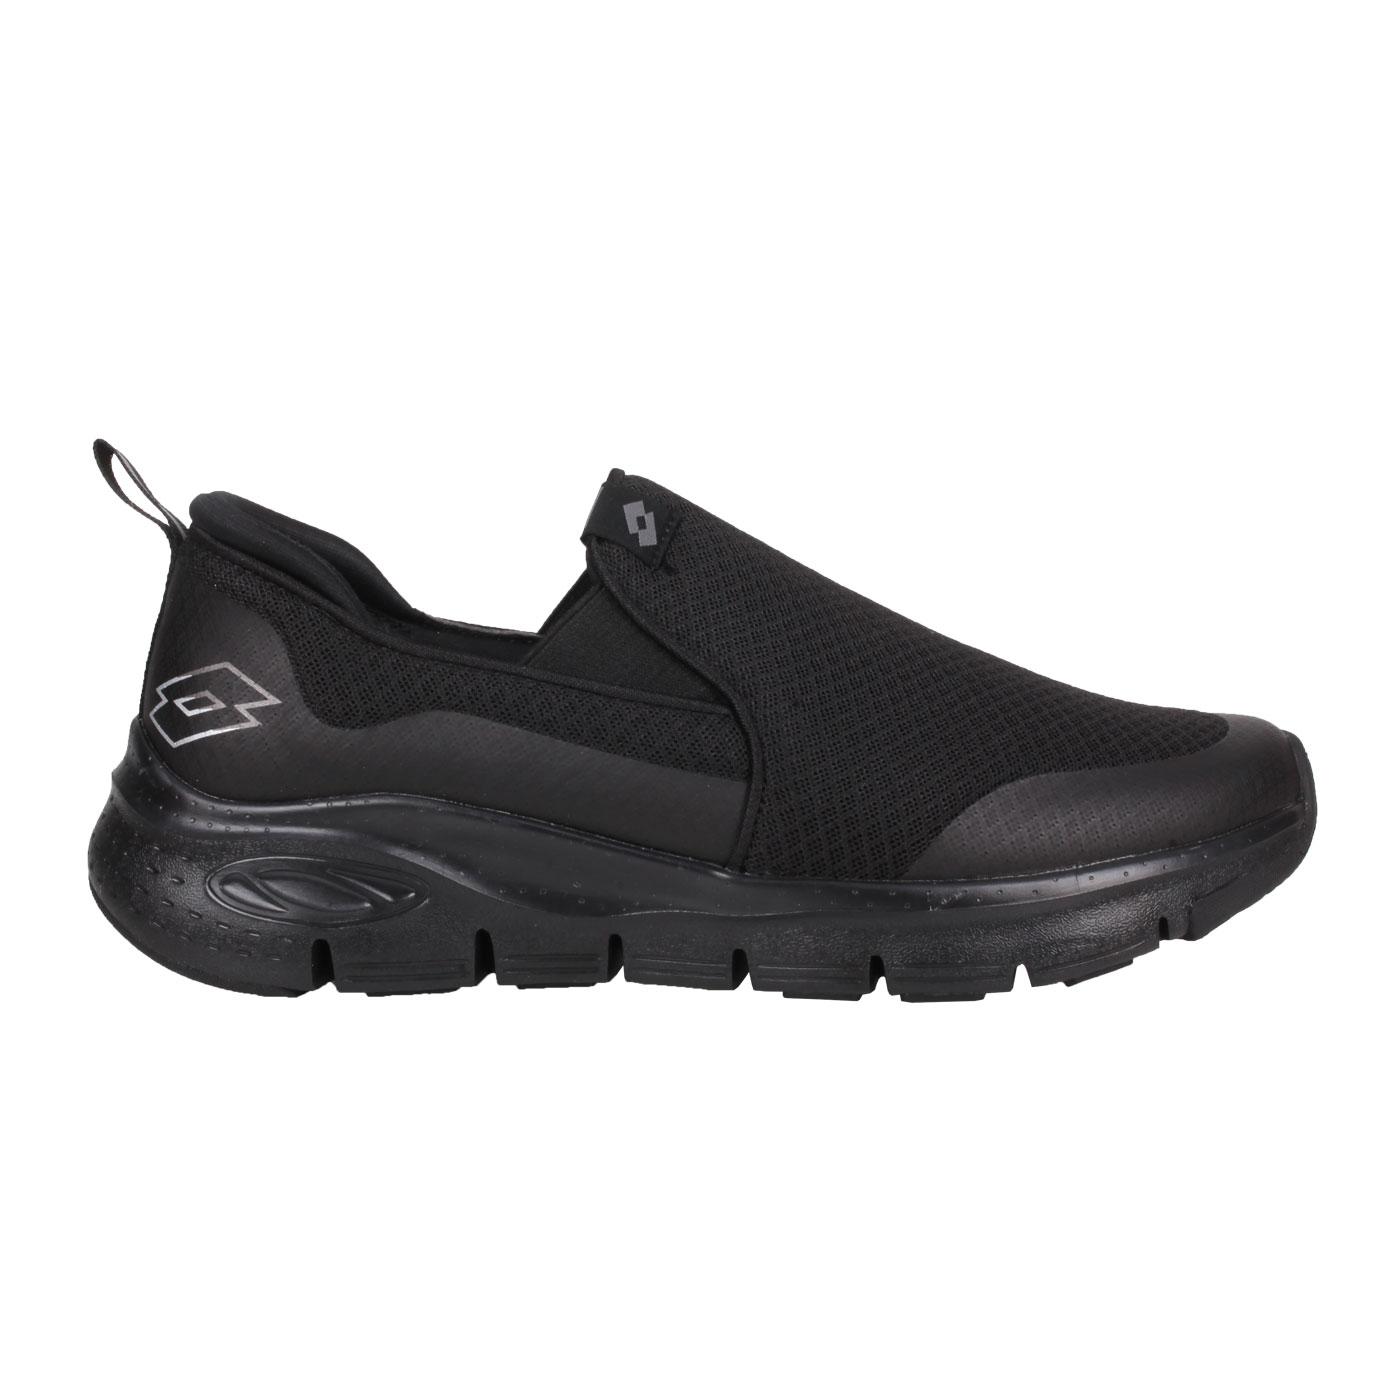 LOTTO 男款透氣健步鞋 LT1AMR3520